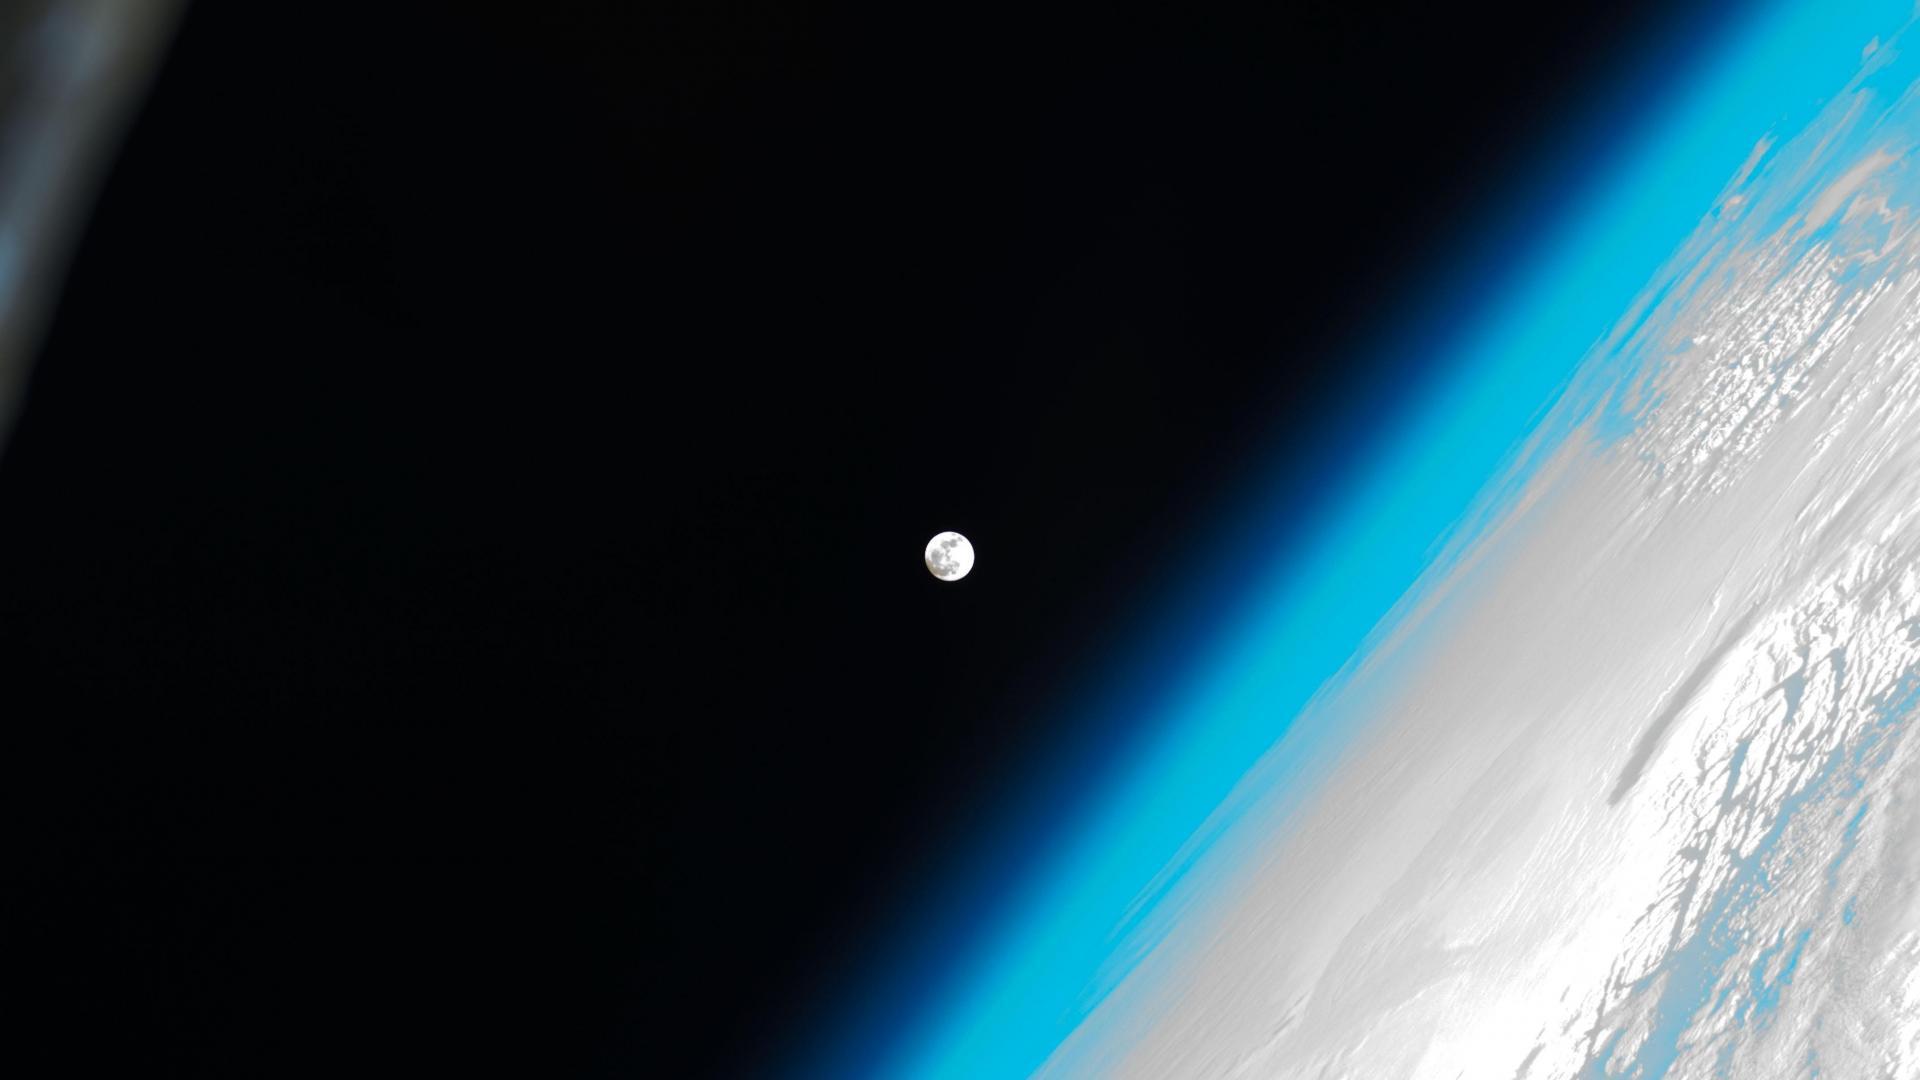 Moon earth nasa international station ozone esa wallpaper 1920x1080